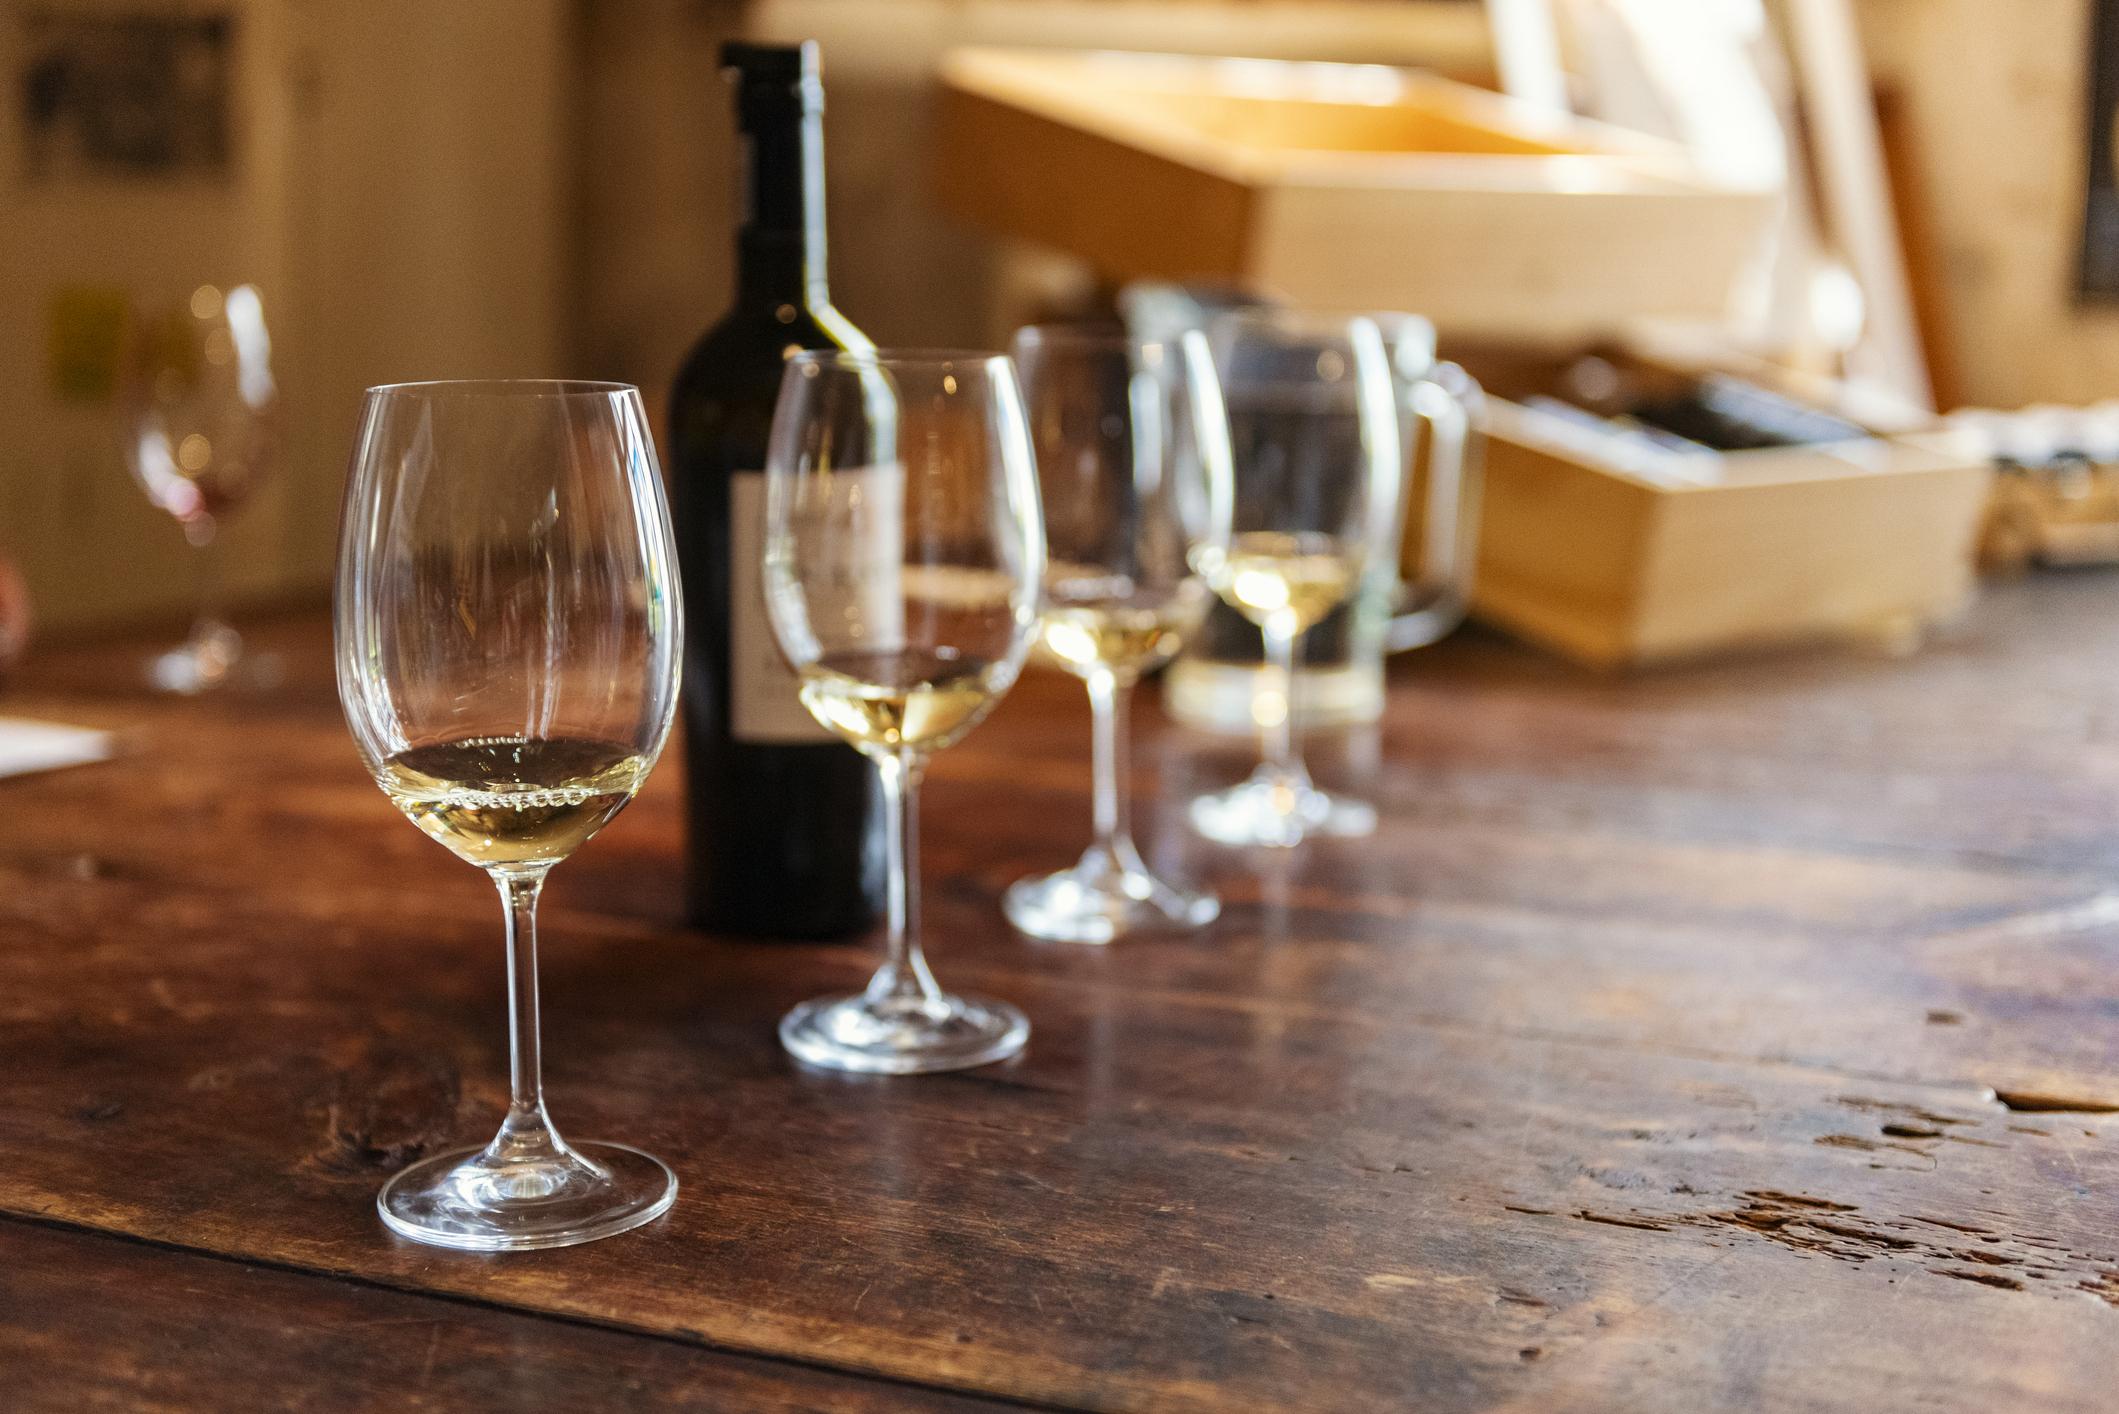 Row of Transylvania white wines